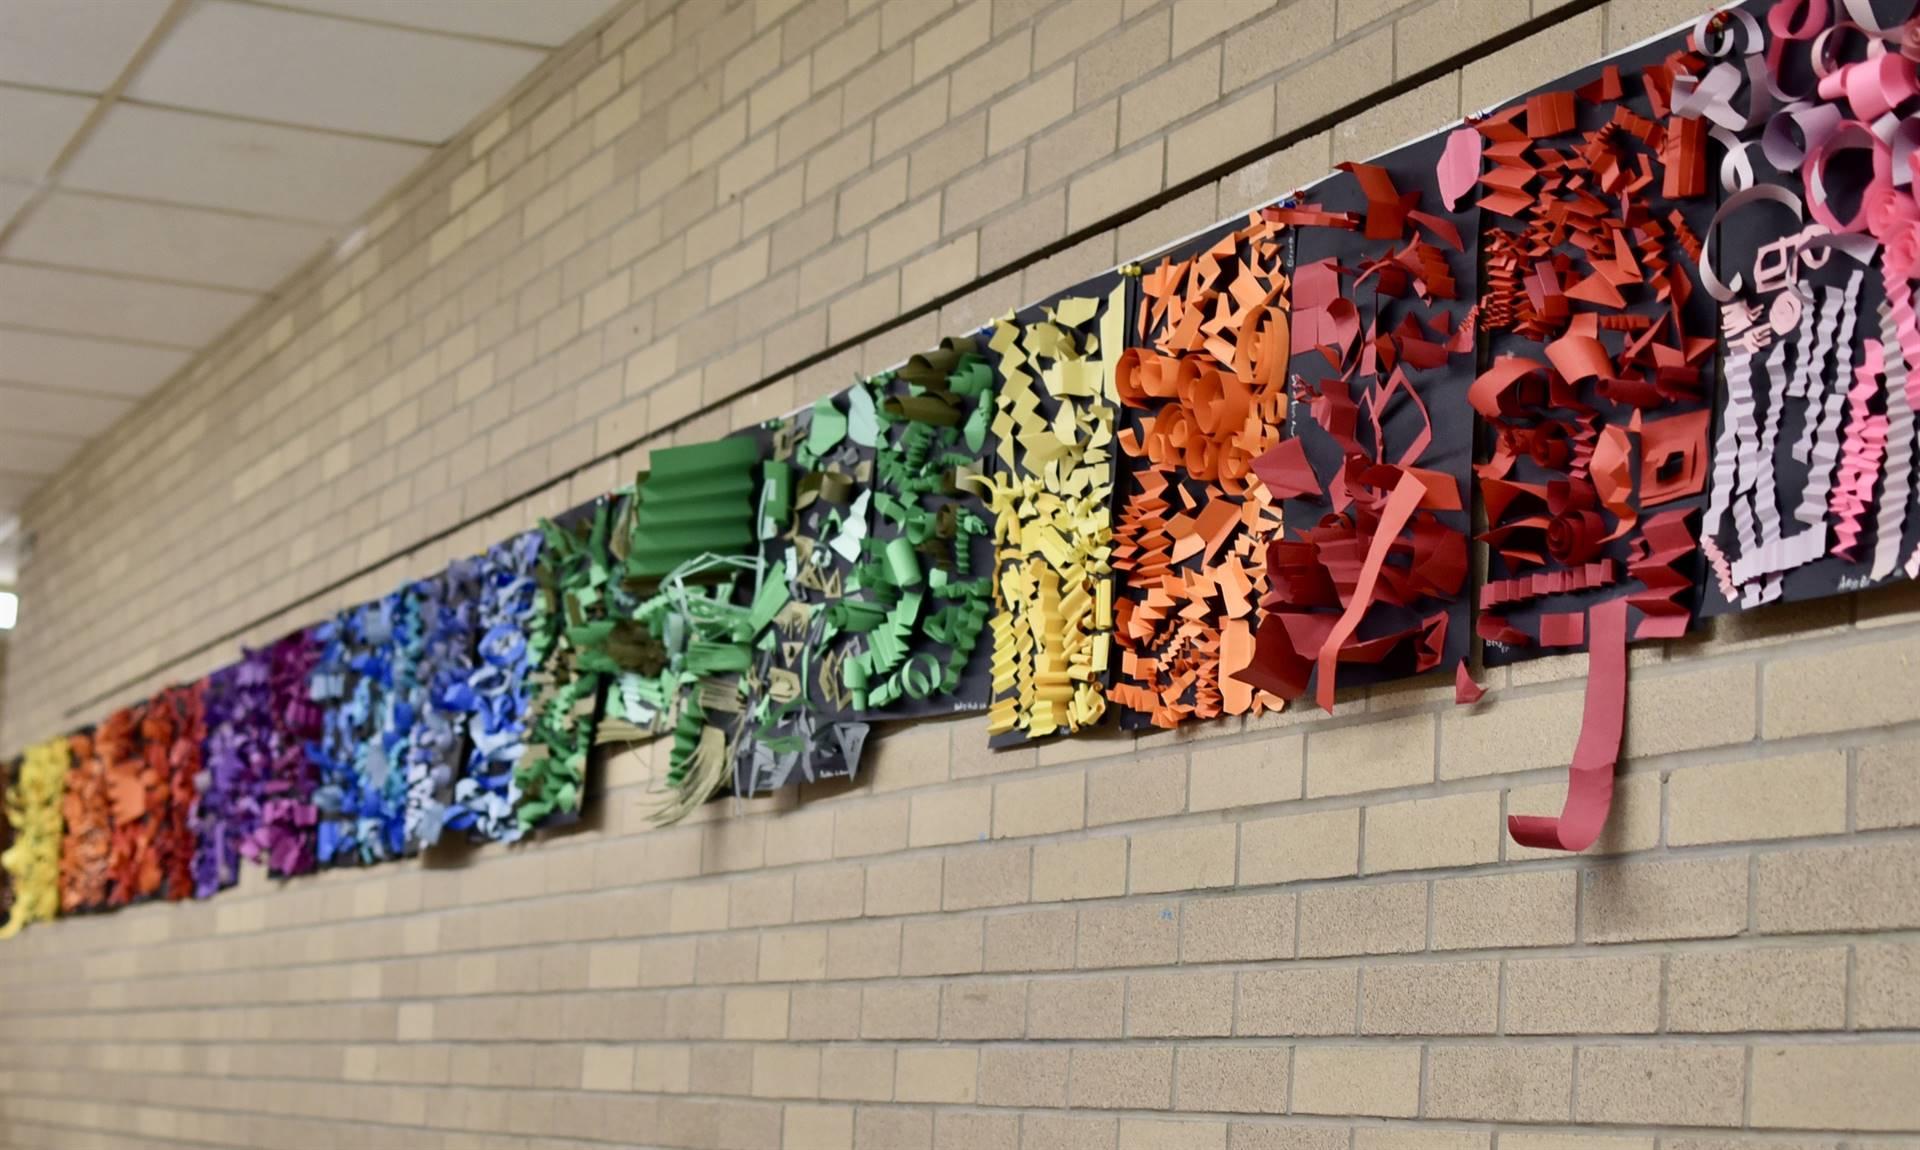 Brecksville-Broadview Hts. Middle School Art Projects 179